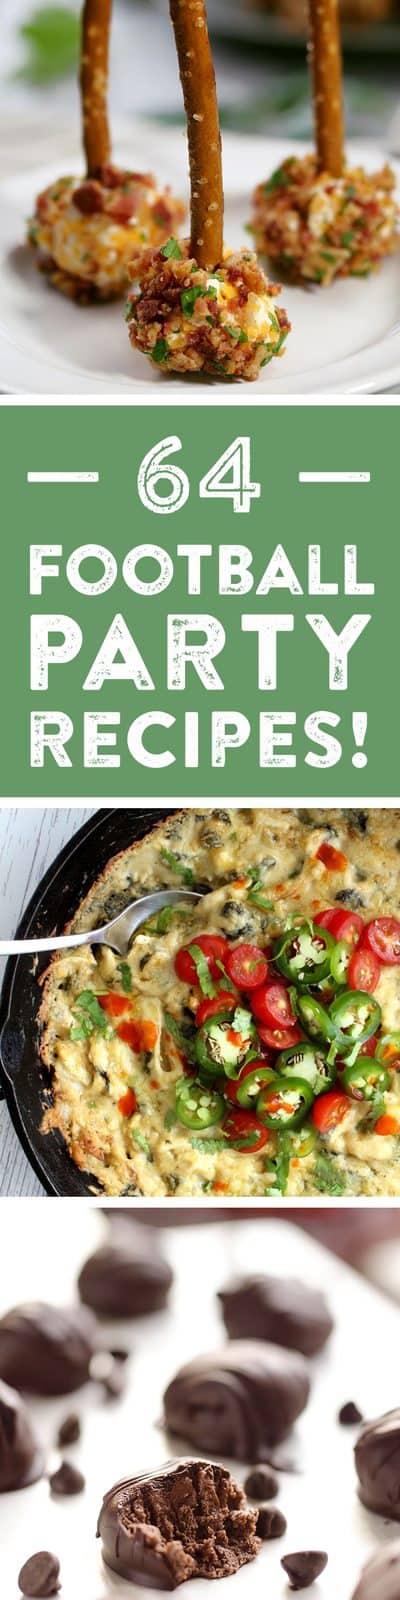 football-party-recipes-long-pin